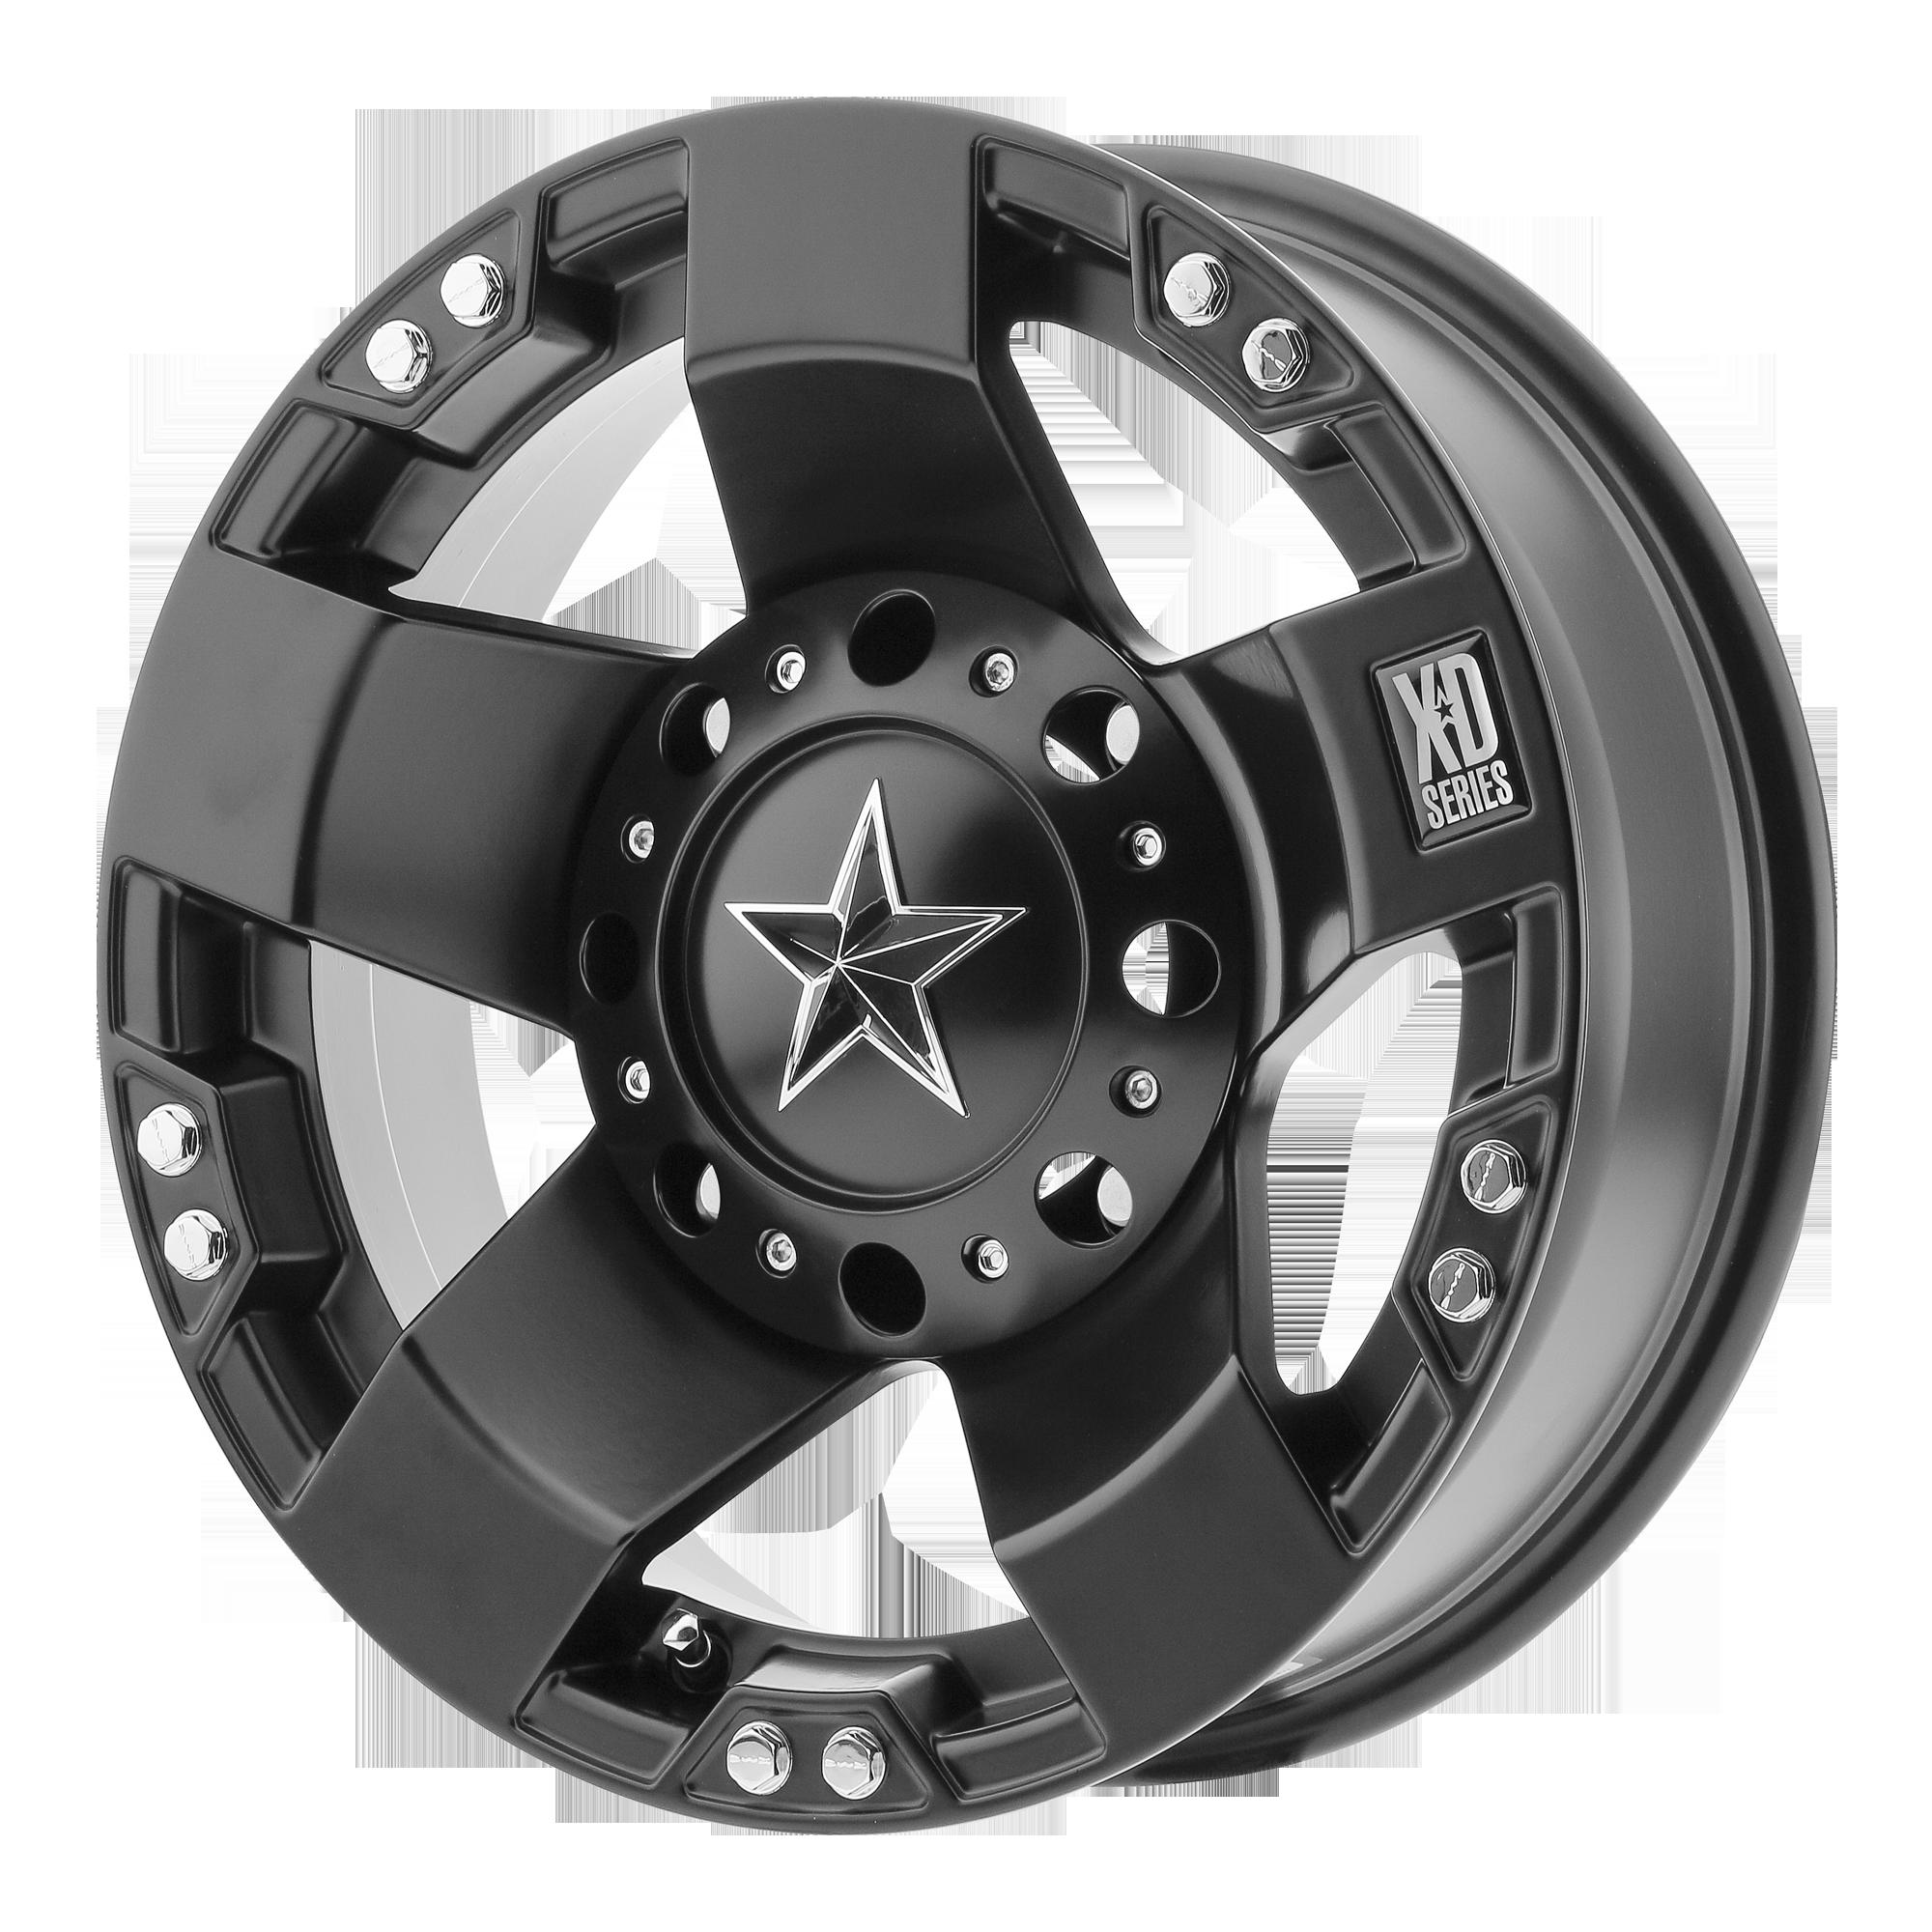 XD Series by KMC Wheels XS77547048700